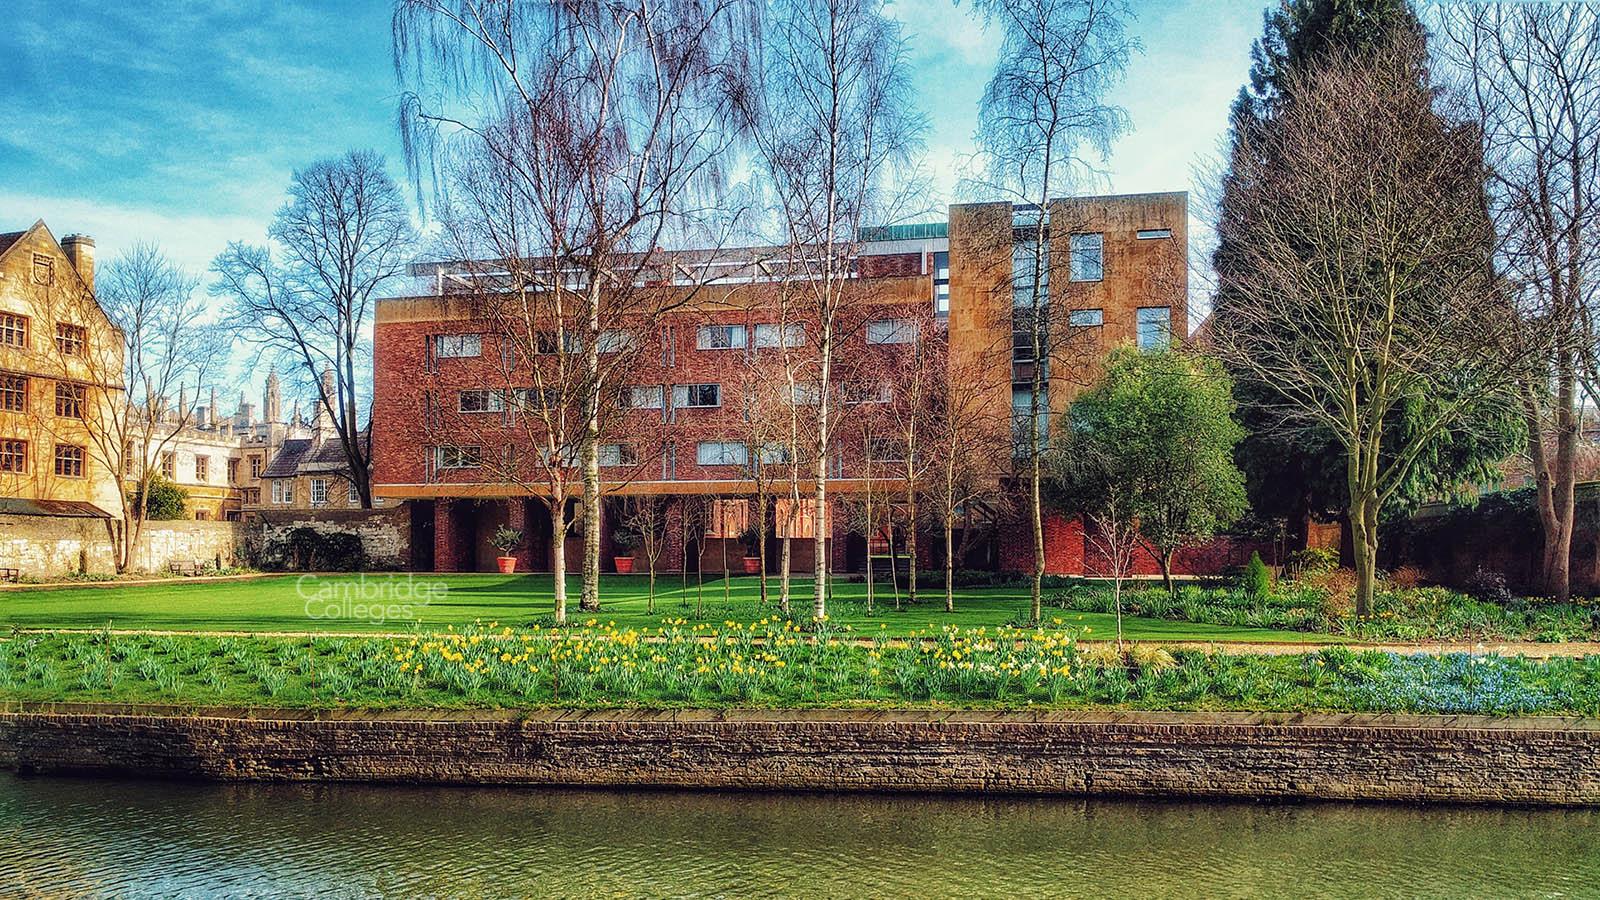 The Erasmus building of Queens' college, Cambridge